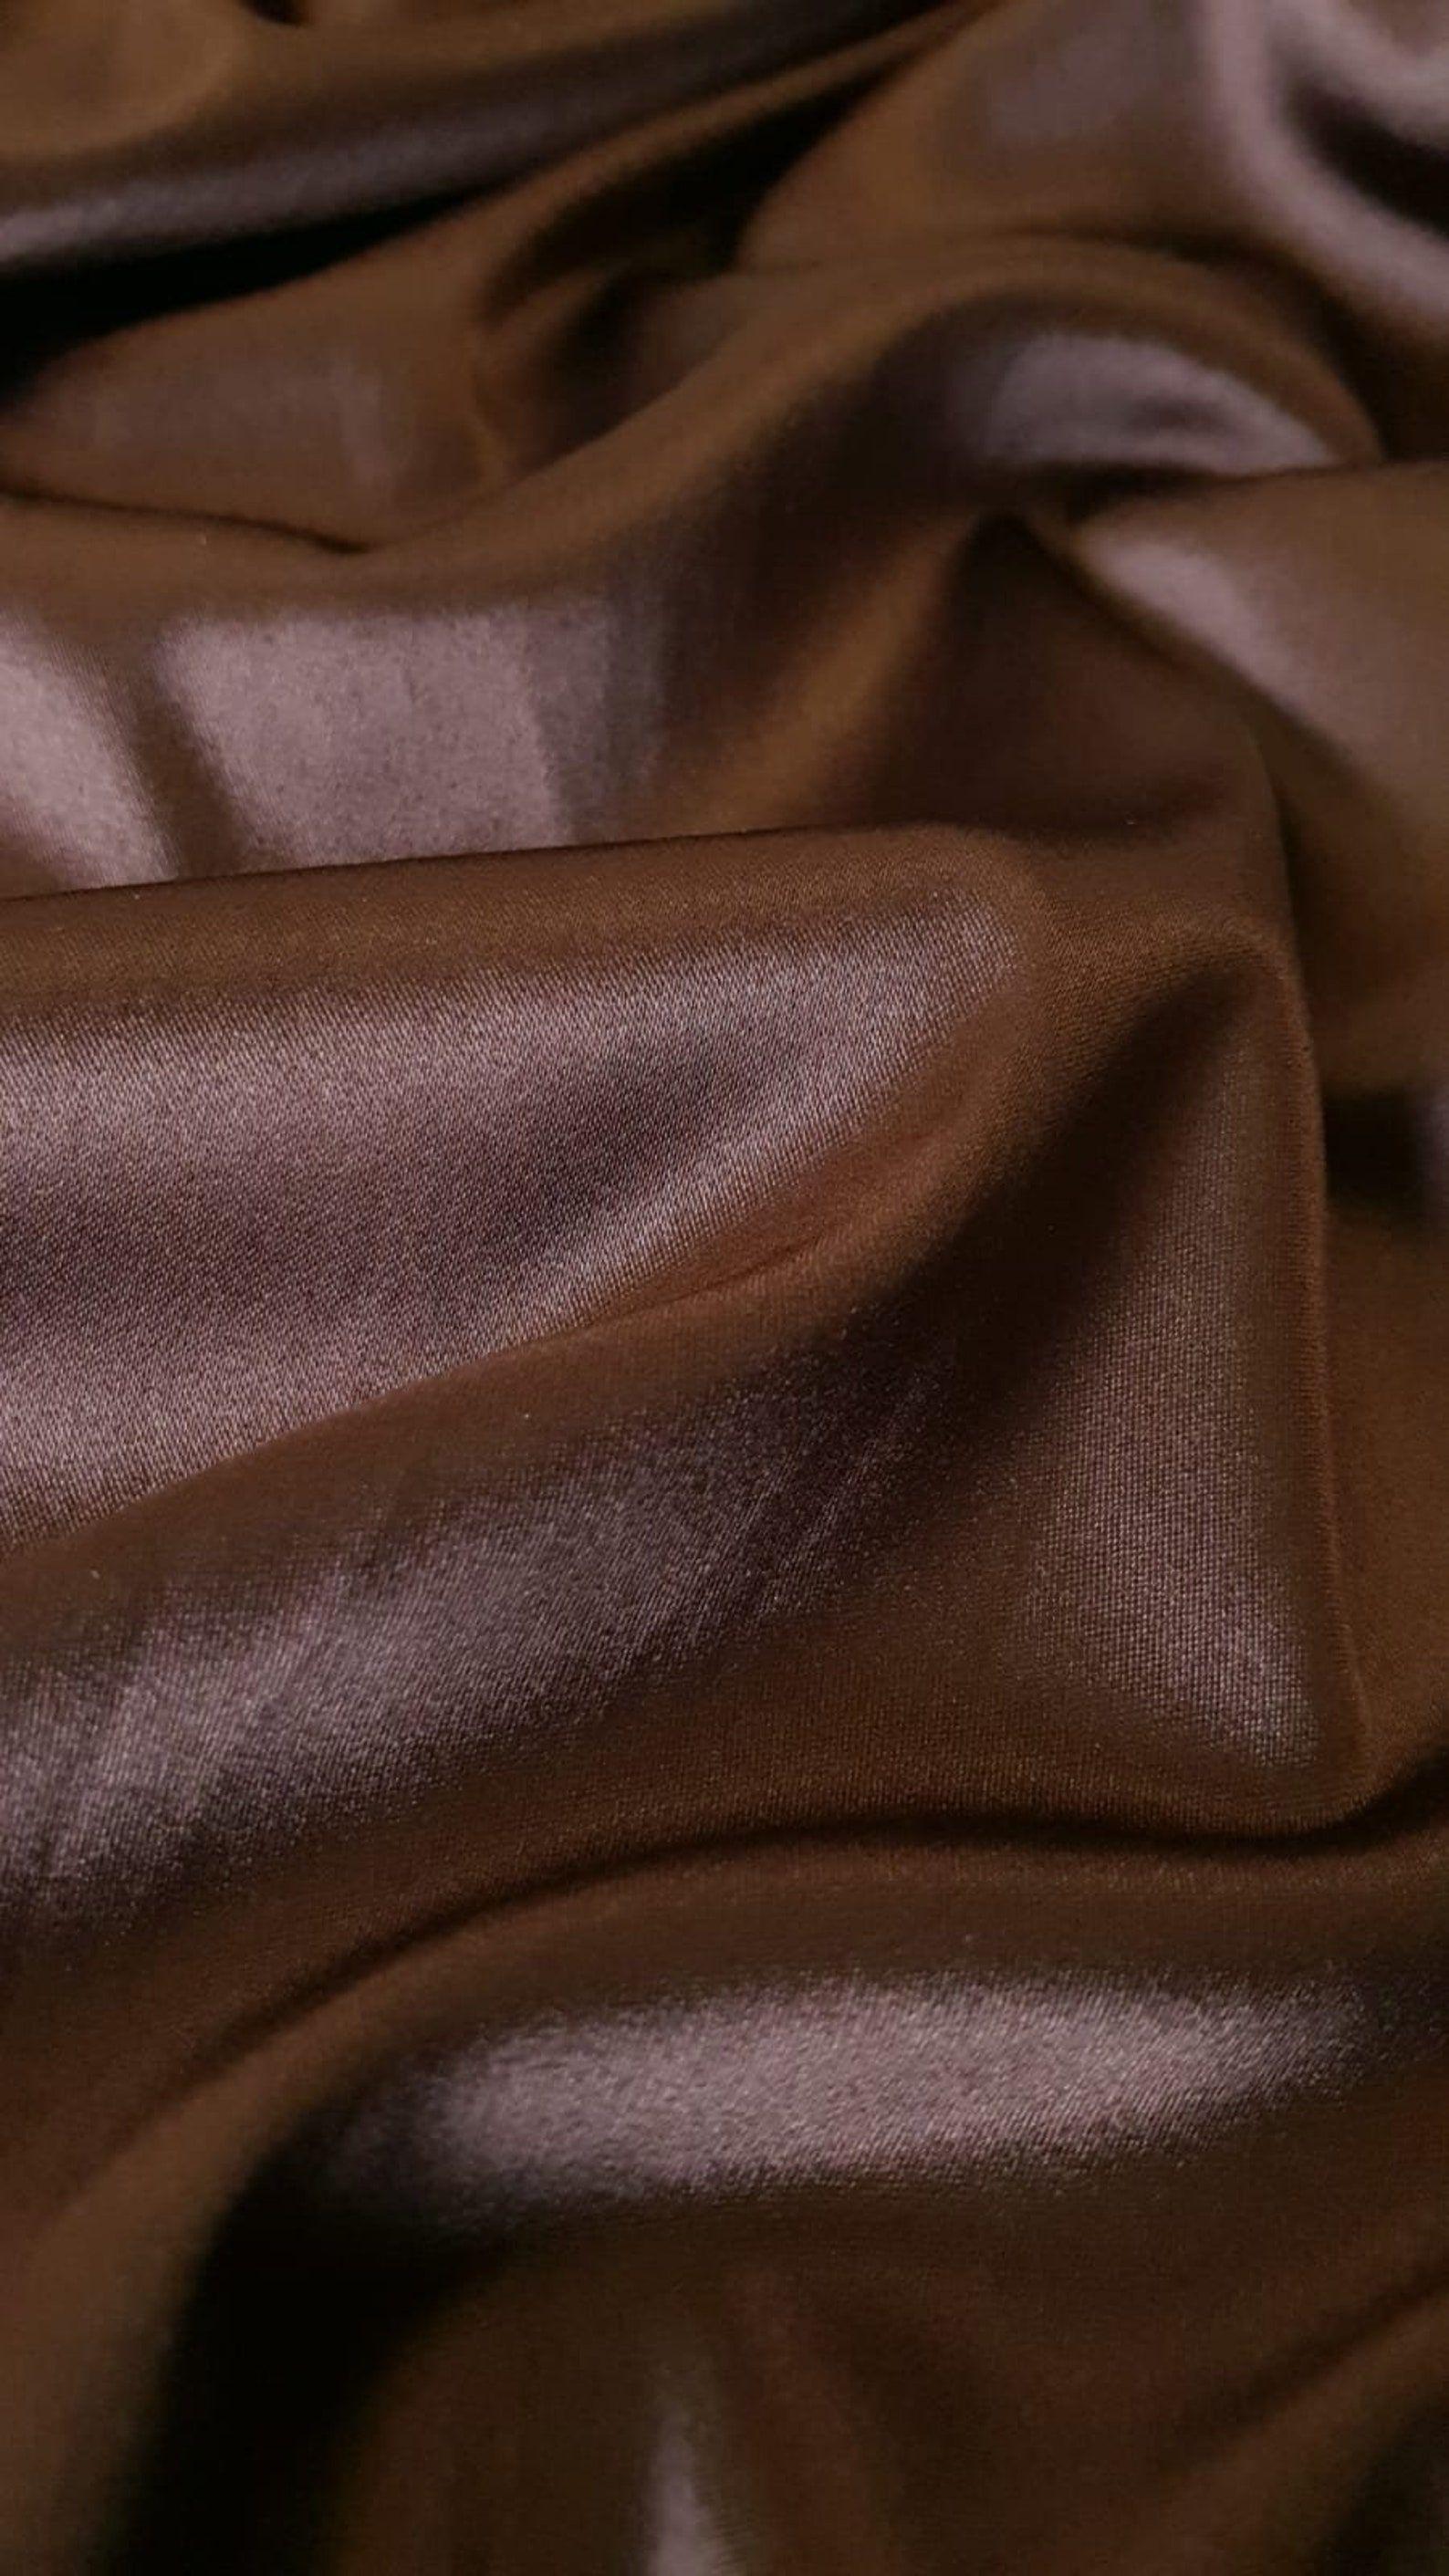 Chocolate brown satin fabric, Satin fabric with elastan, Lingerie fabric, Italy satin fabric, Lingerie fabric, Elastic fabric Z00389